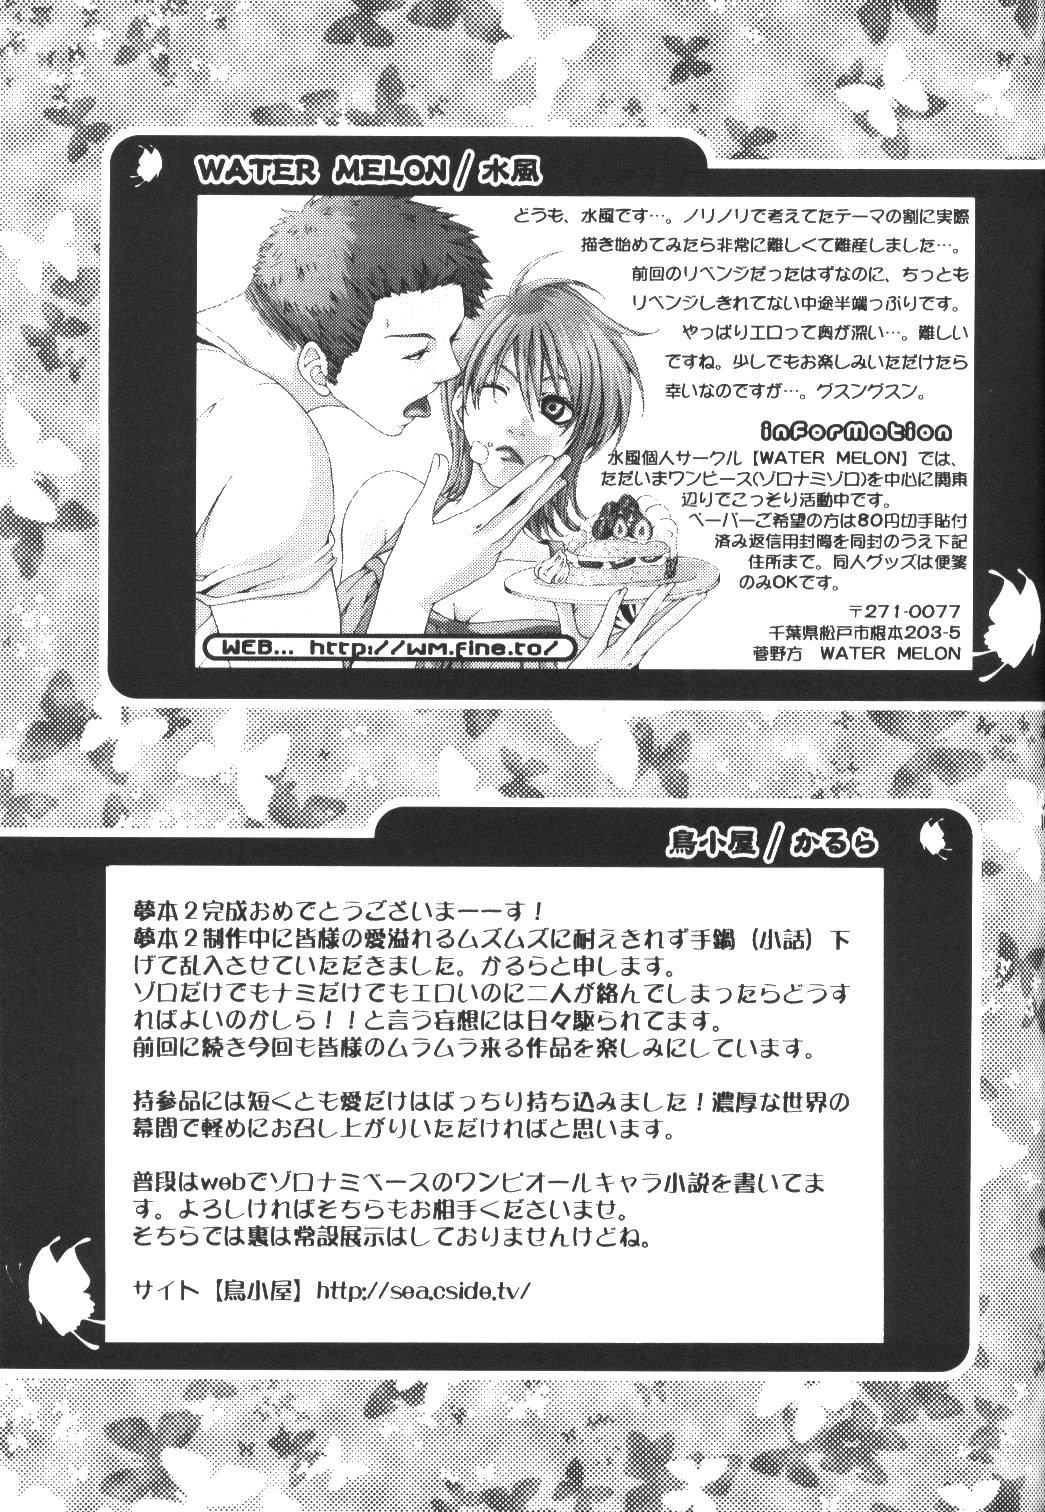 Yume Ichiya 2 101